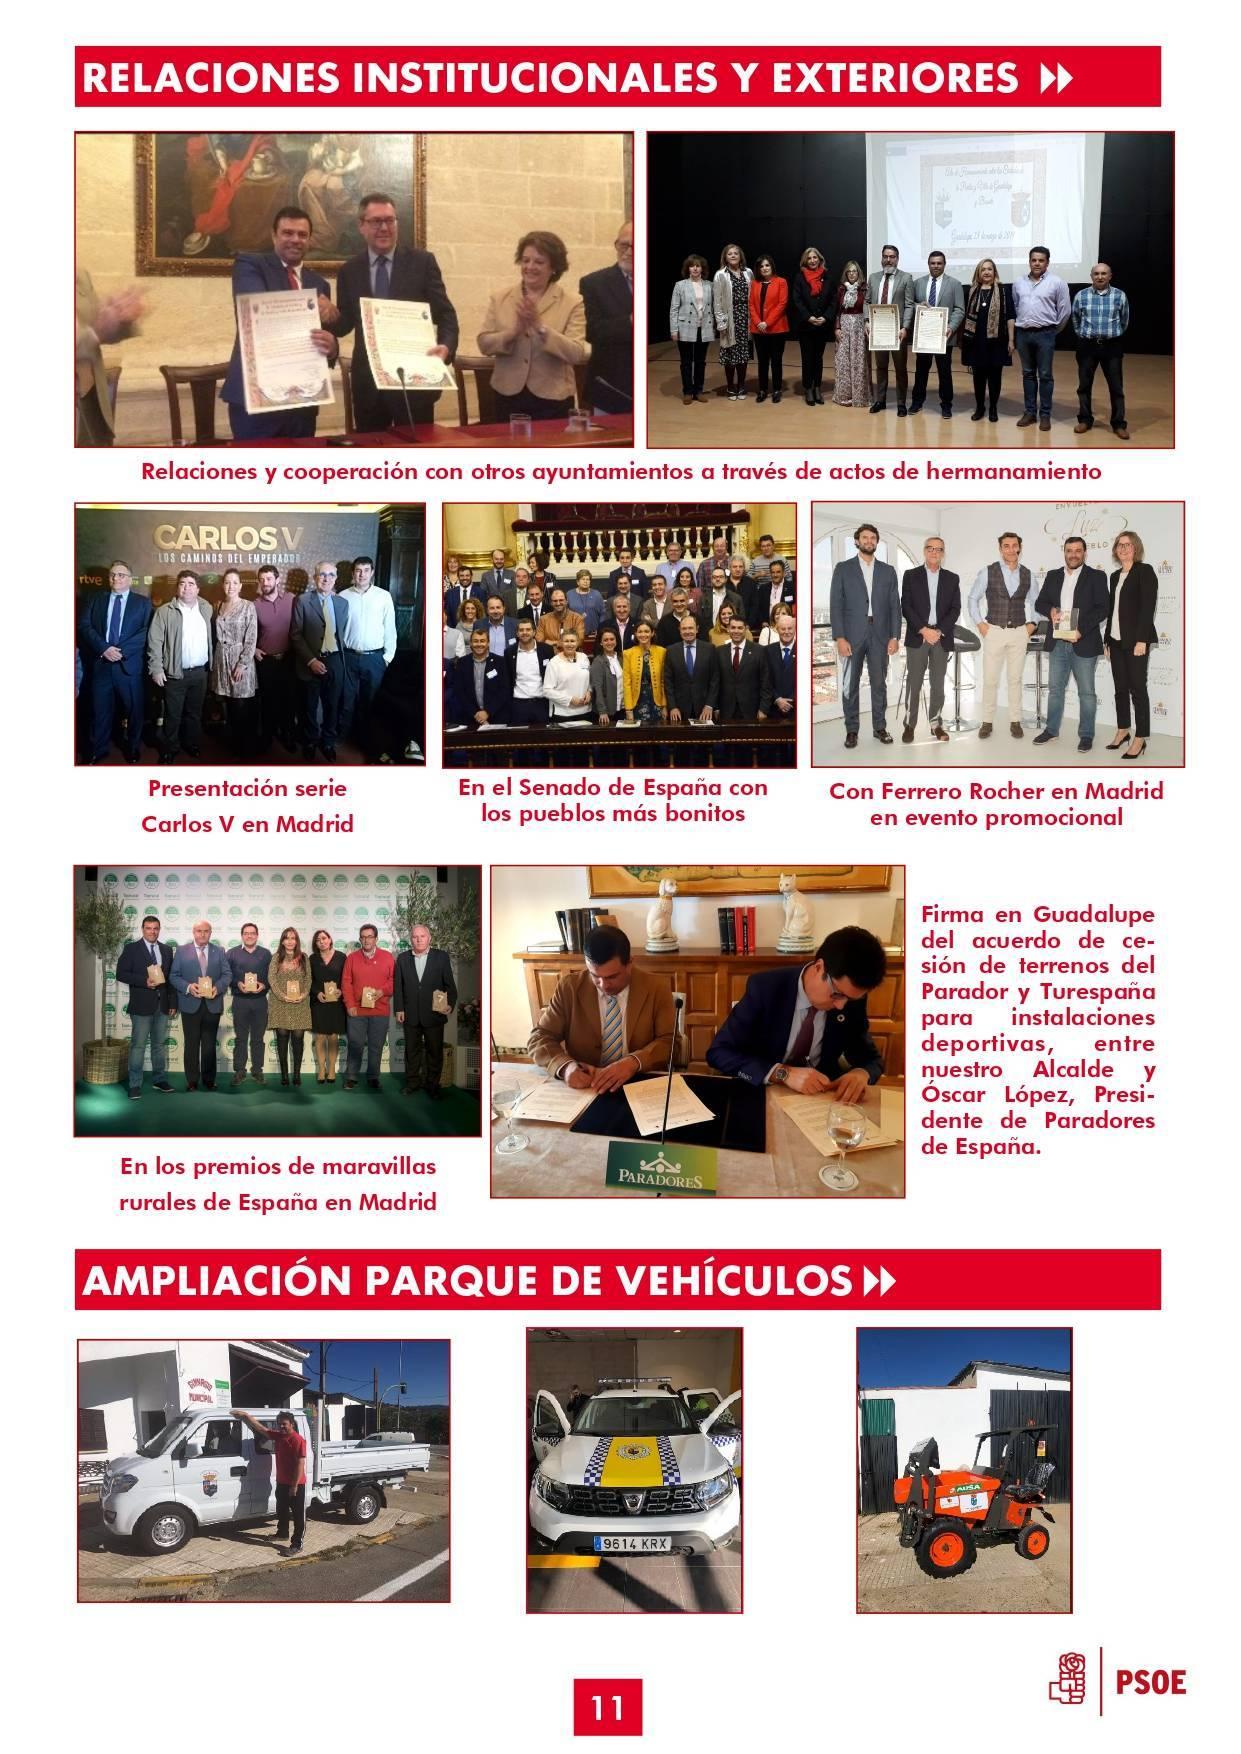 Boletín informativo de gestión municipal 2015-2019 - Guadalupe (Cáceres) 11